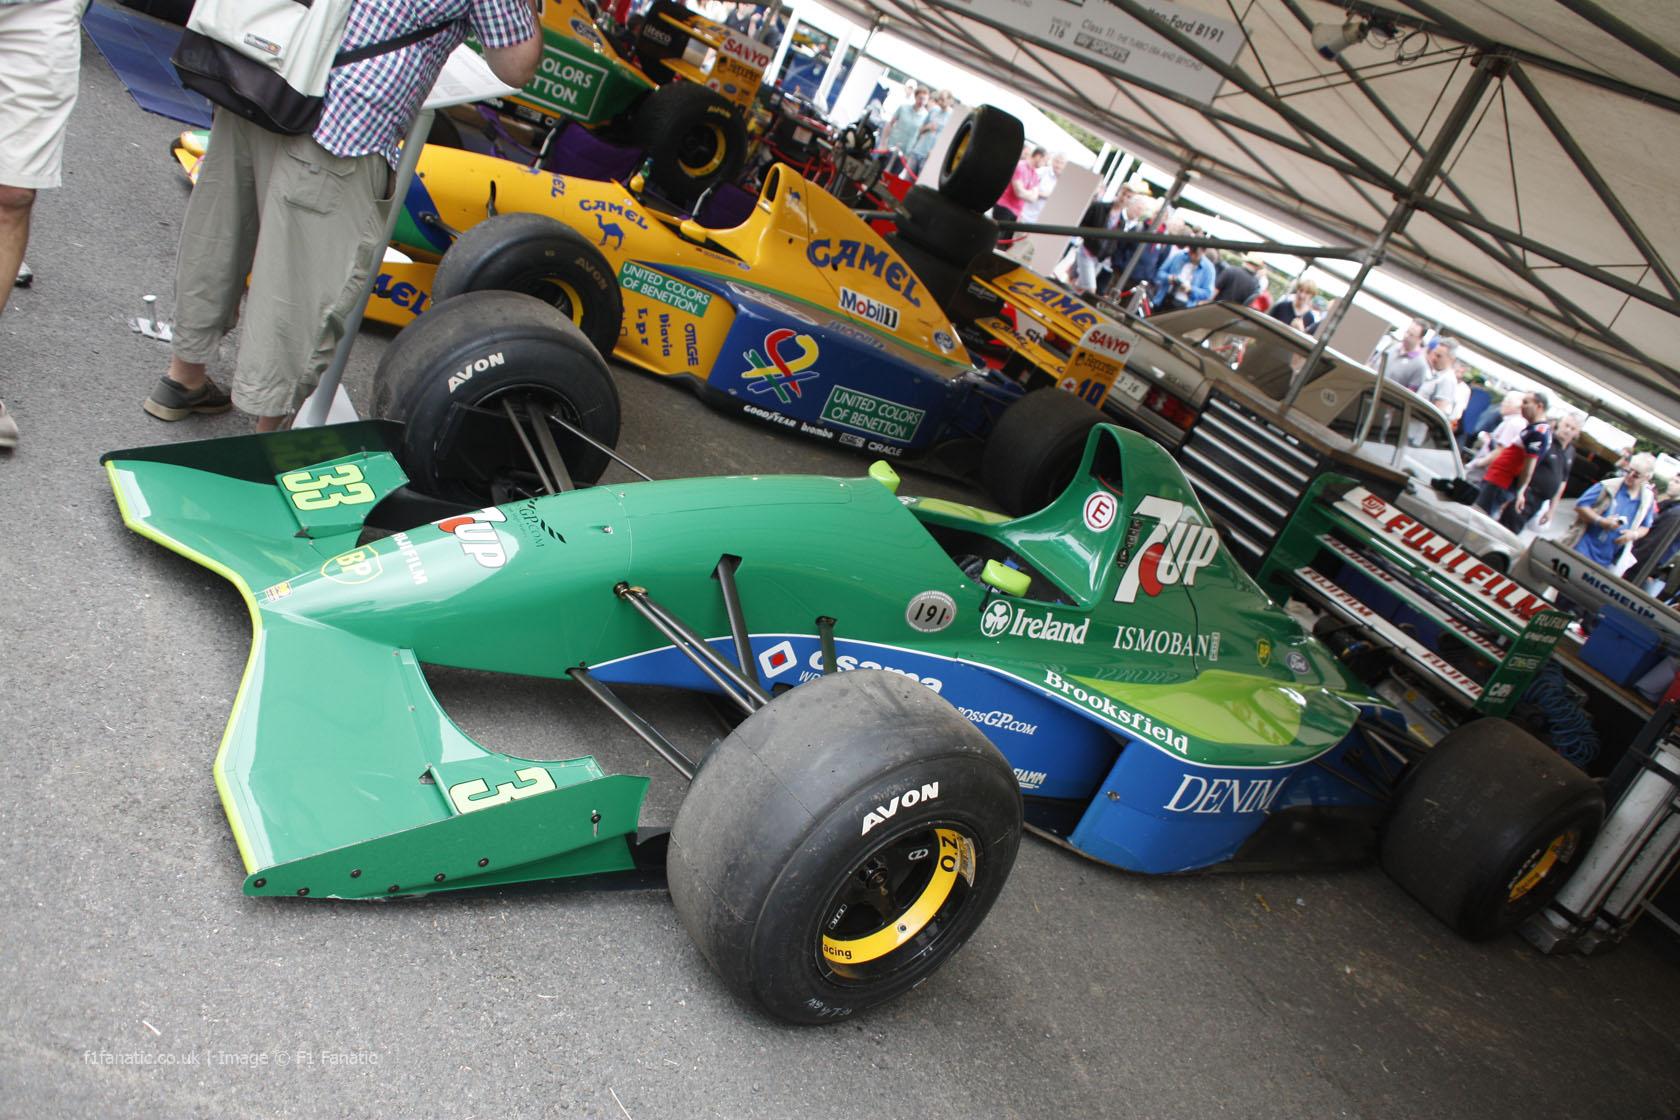 Jordan 191, Goodwood Festival of Speed, 2014